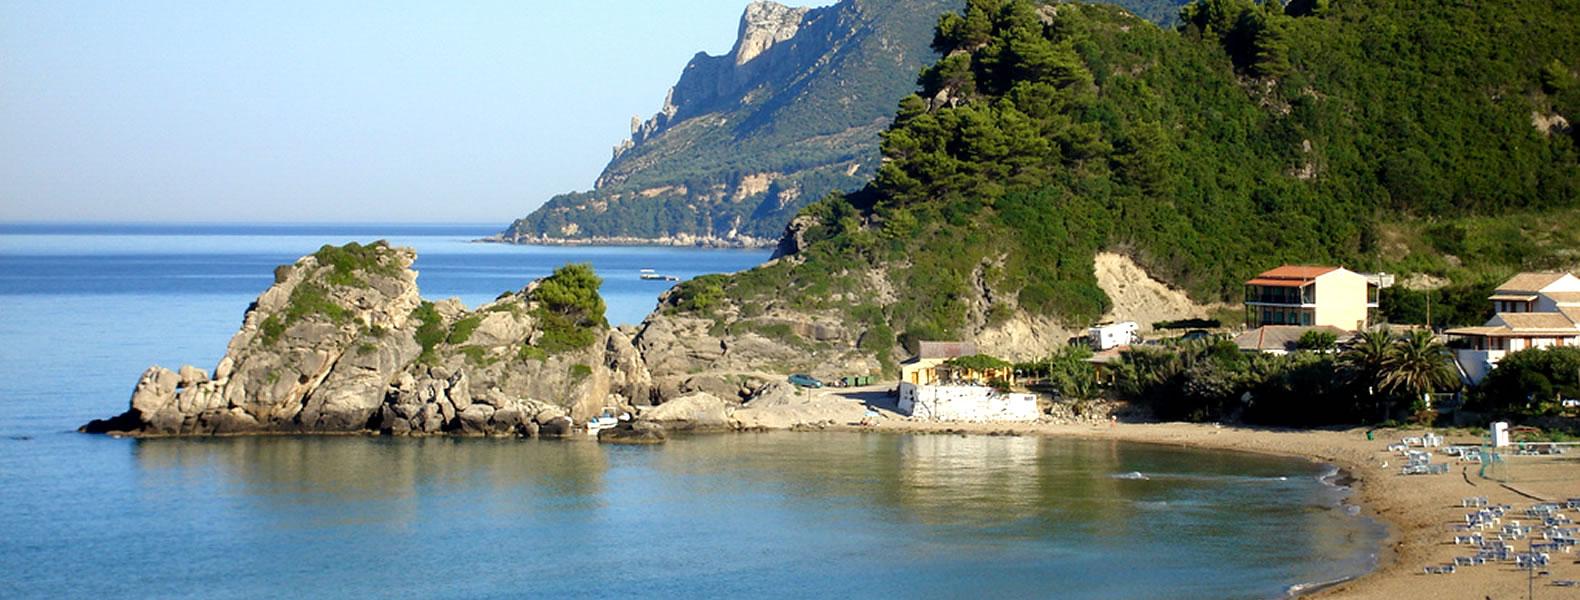 Kontogialos Beach